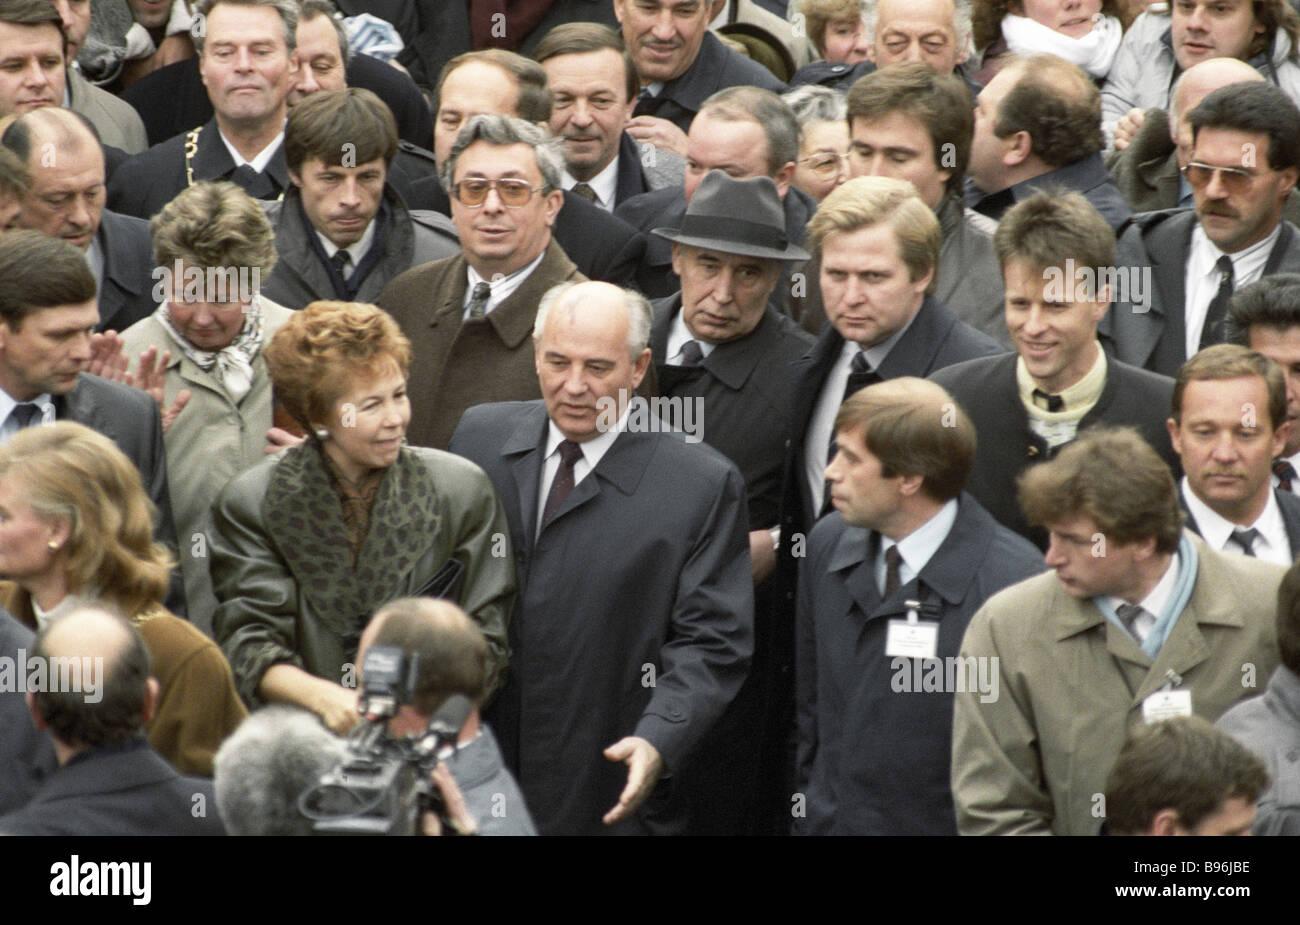 USSR Supreme Council Chairman Mikhail Gorbachev center right Raisa Gorbachev center left and chief of the KGB guard - Stock Image